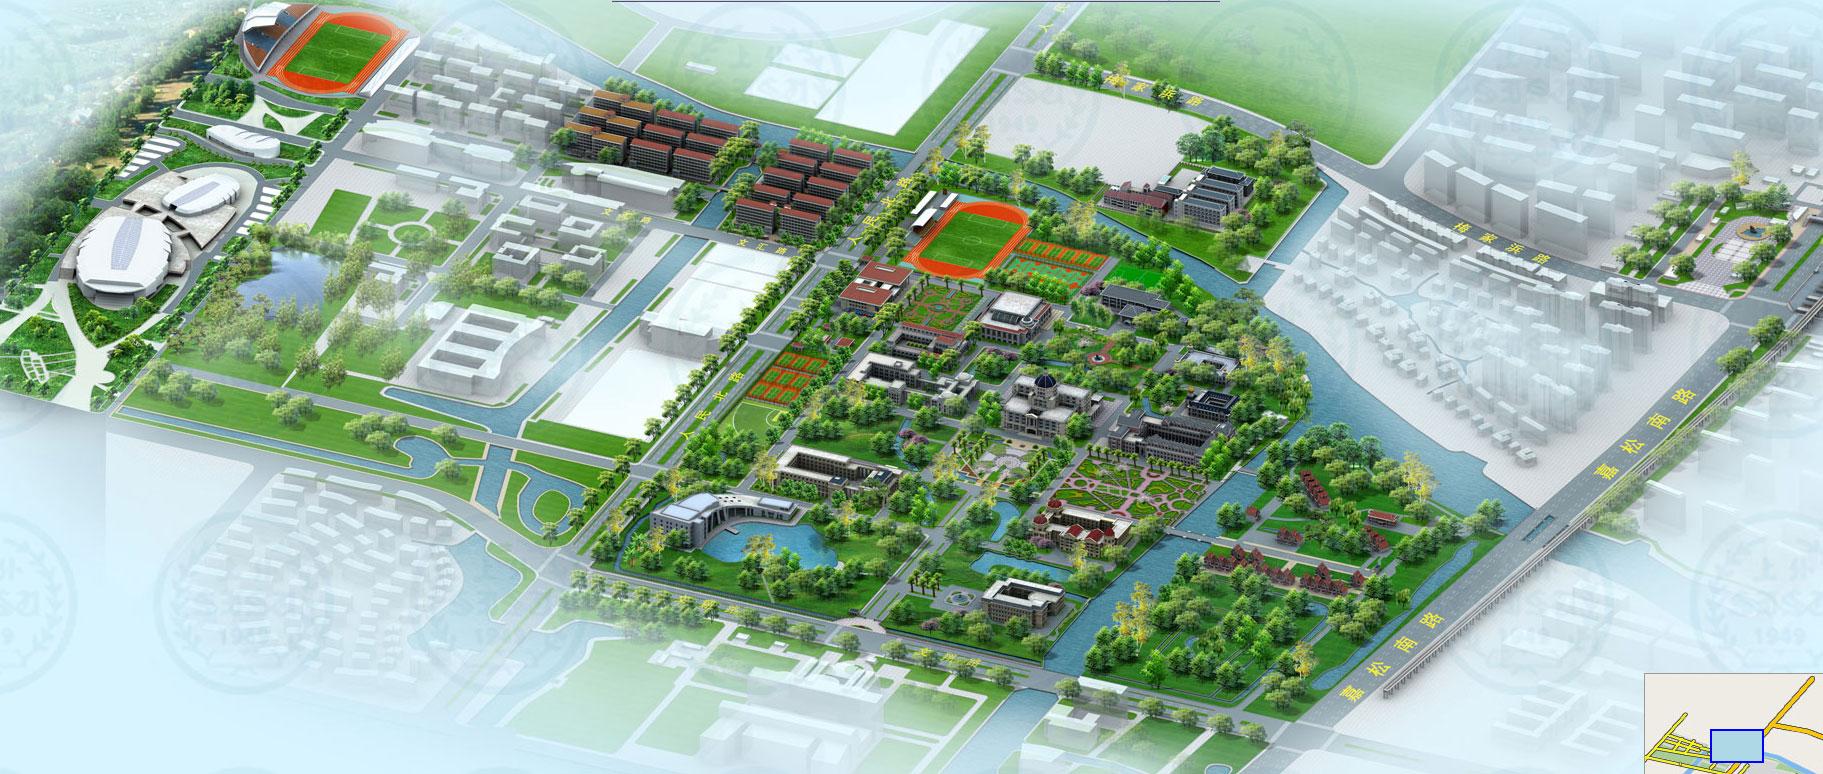 sisu-campus-map